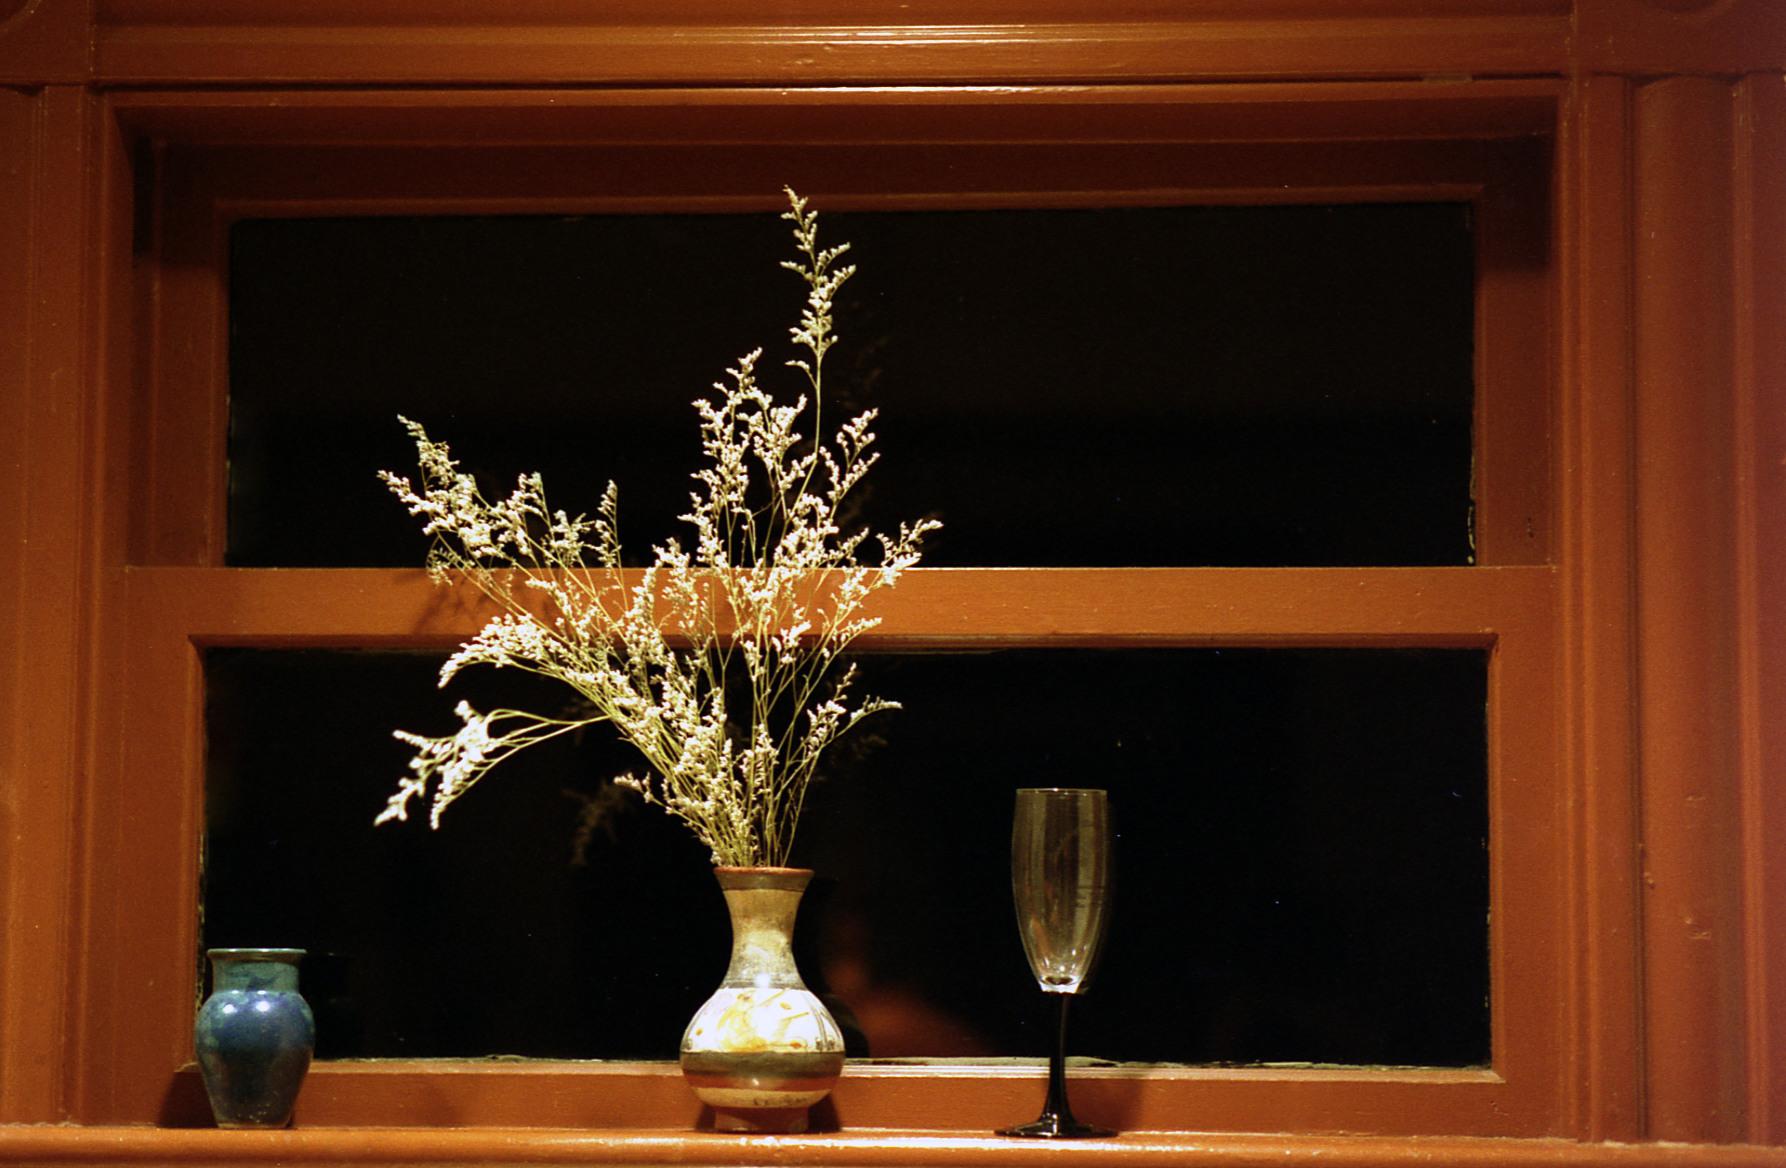 Kitchen window sill, Somerville MA